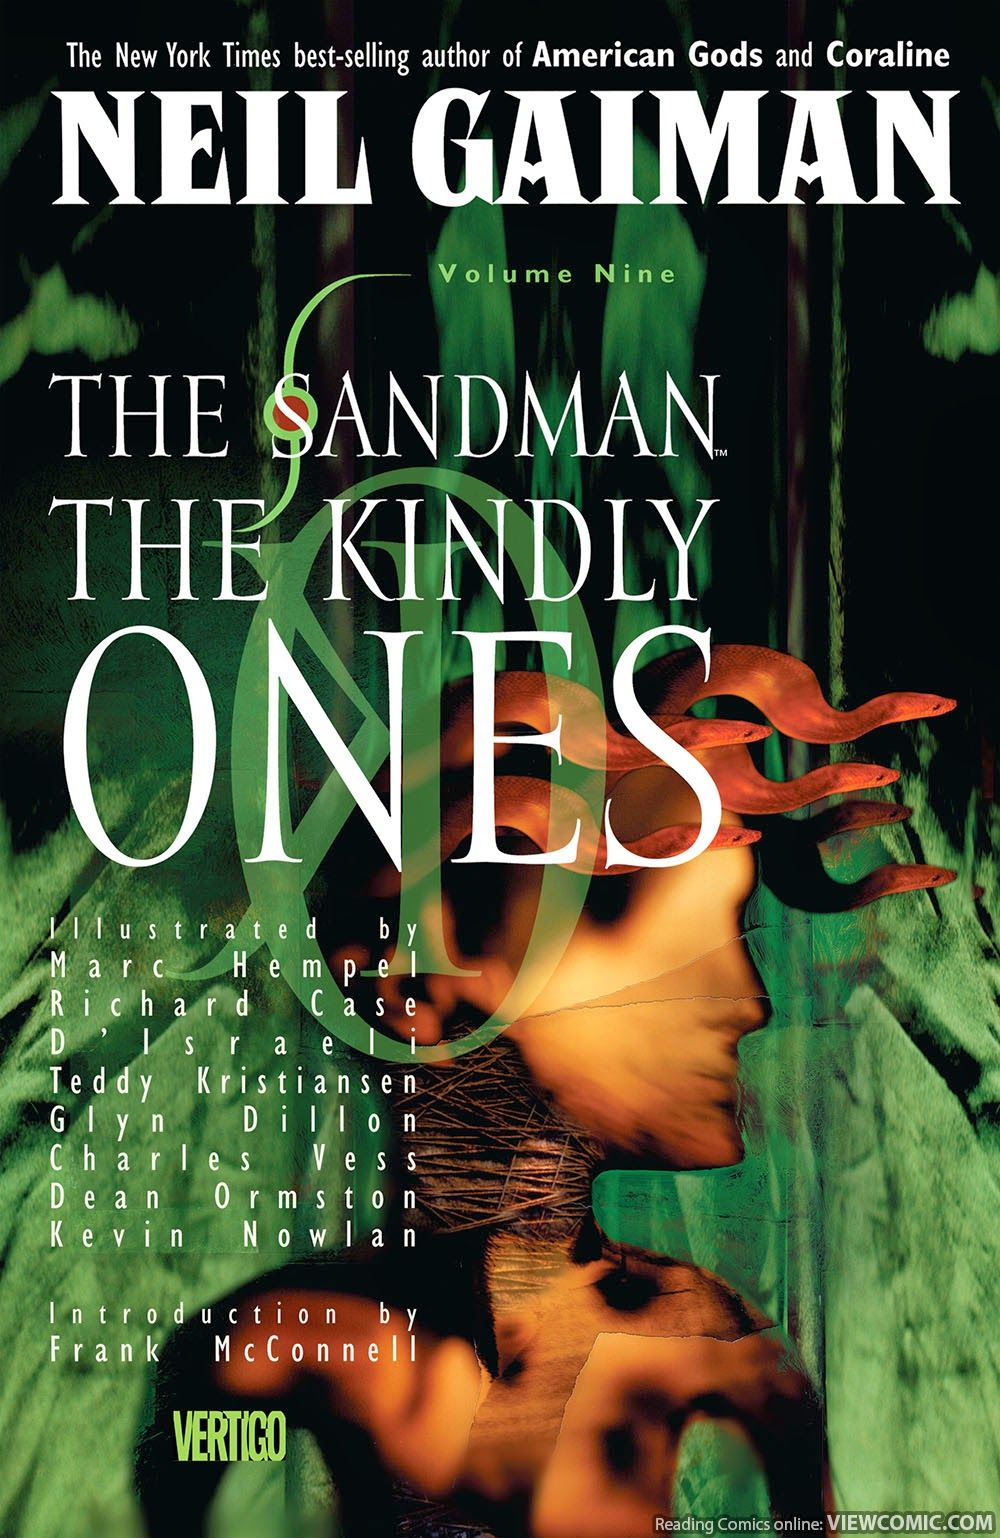 The Sandman V09 The Kindly Ones 2012 Viewcomic Reading Comics Online For Free 2018 Neil Gaiman Graphic Novel Sandman